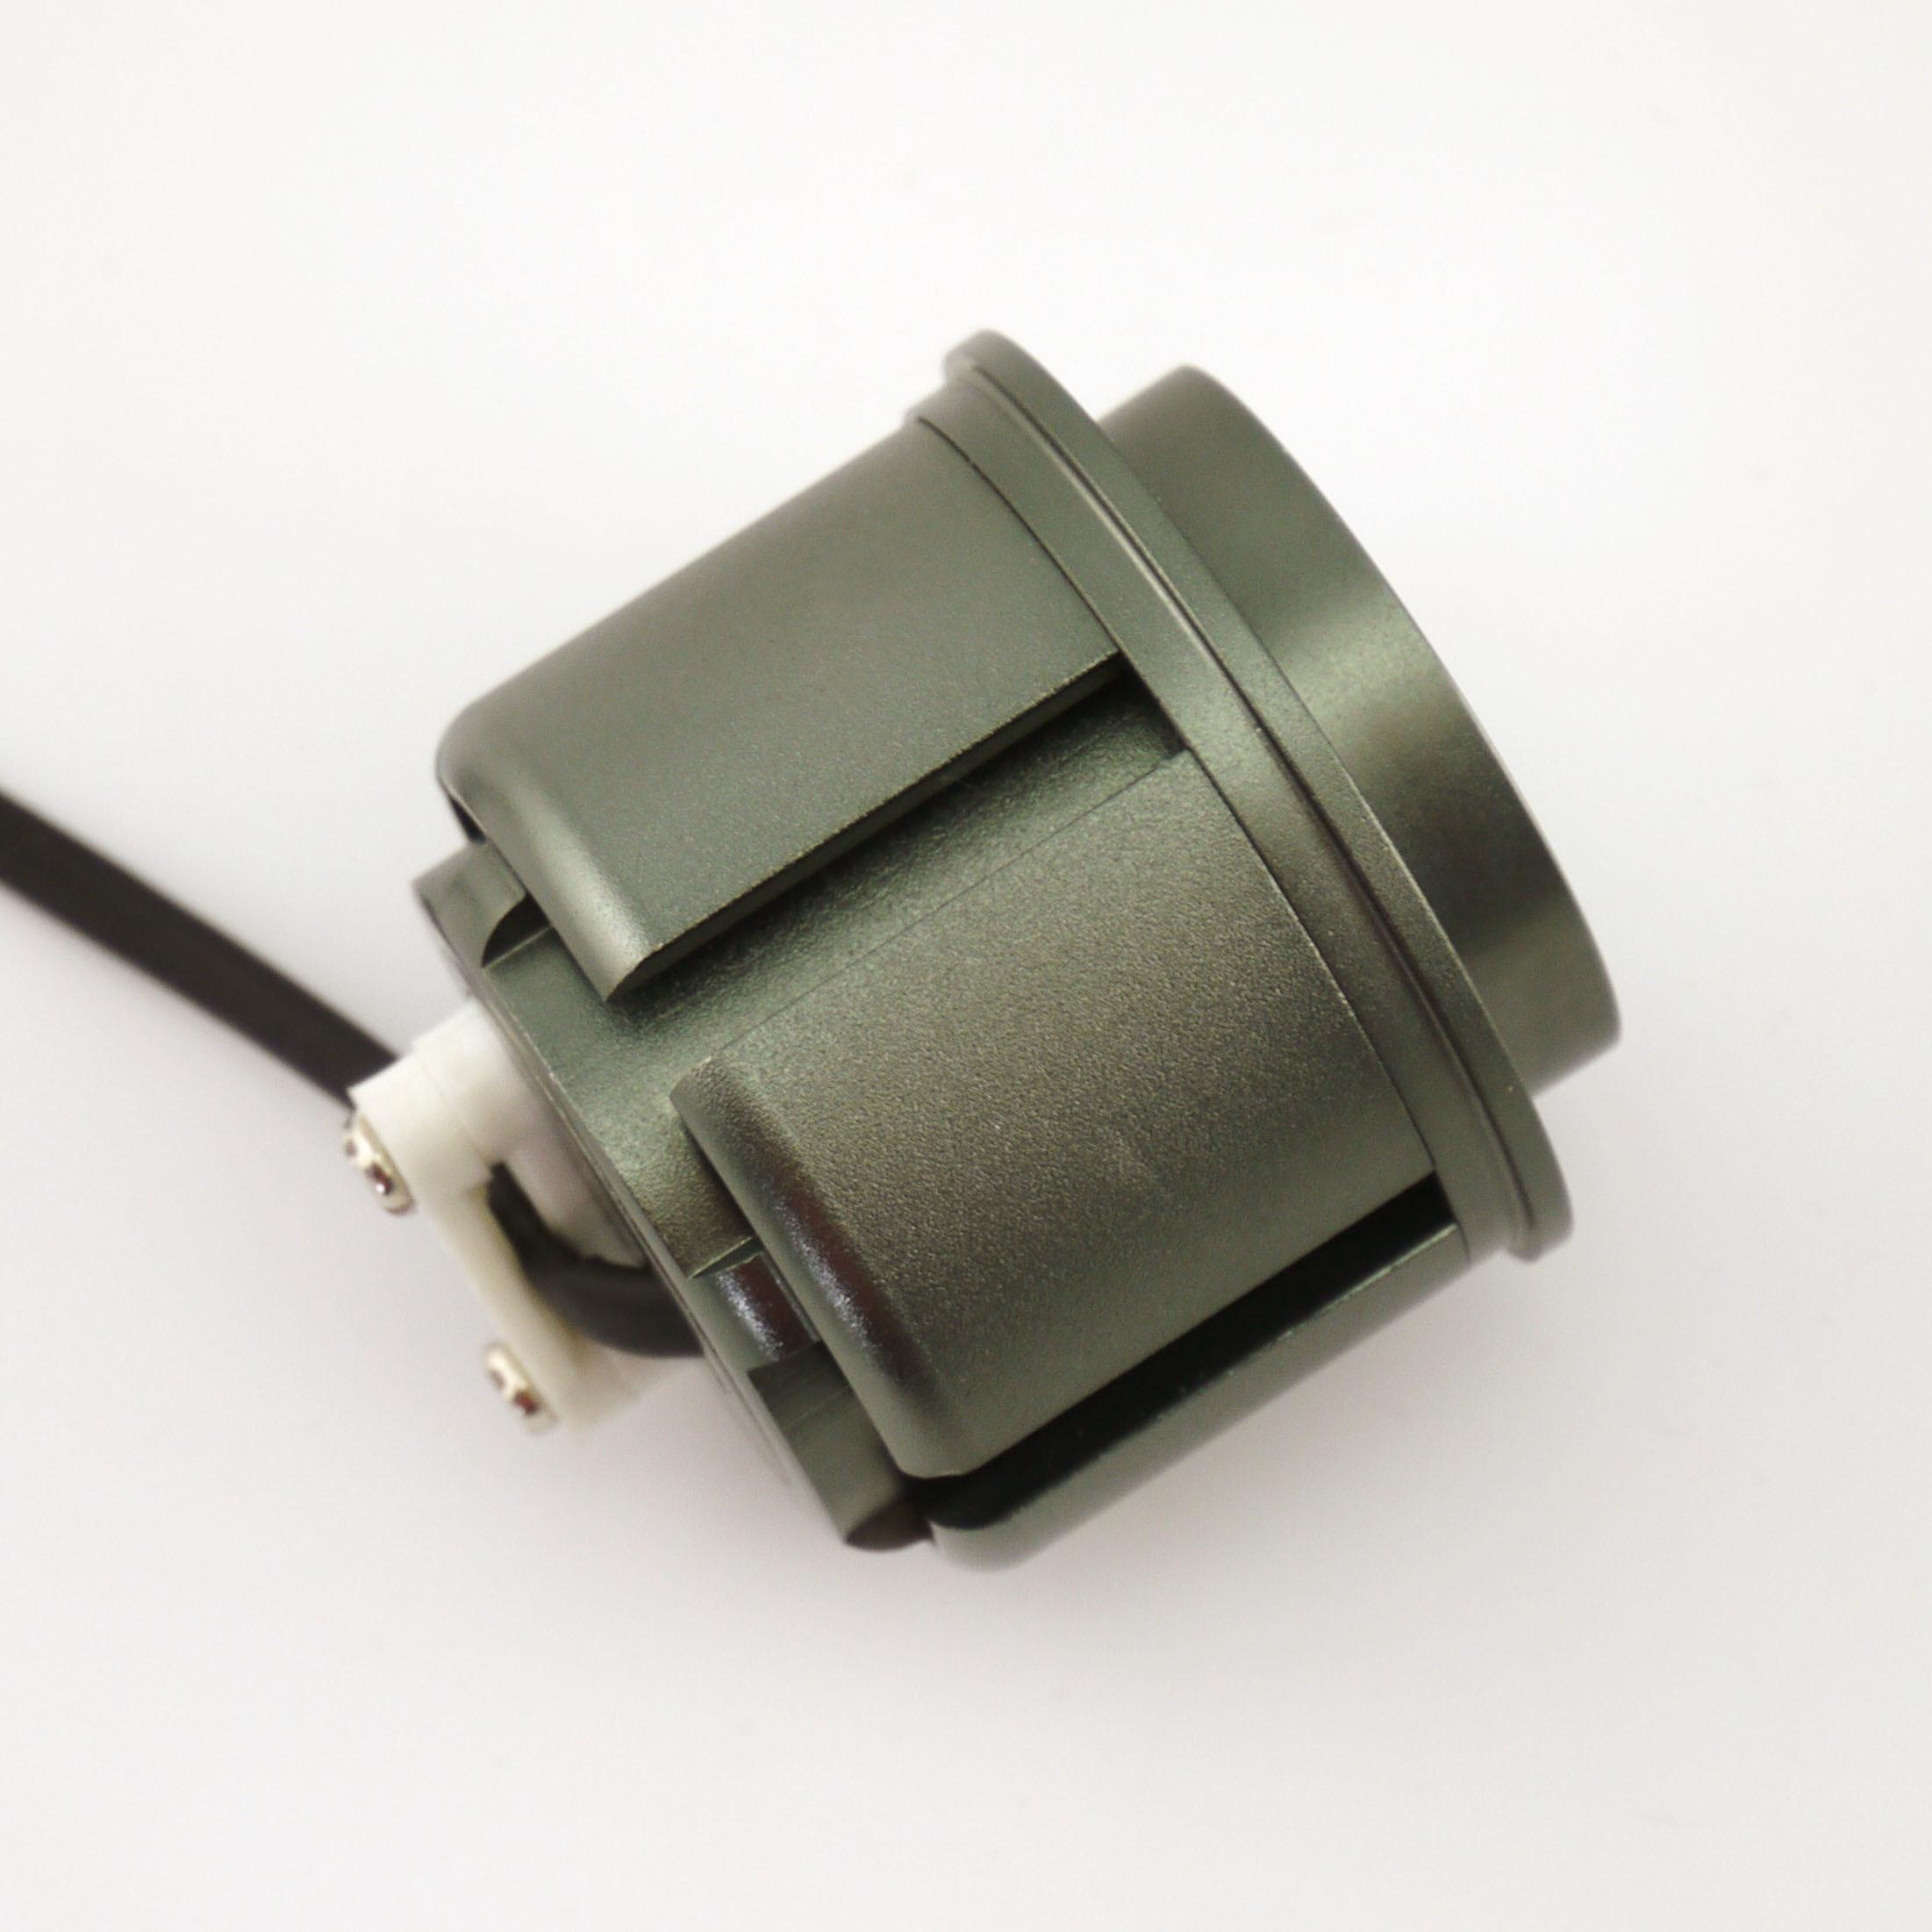 Aluminum 7W COB LED Recessed Down Light Bulb (external power supply) (Lt8001-7W)